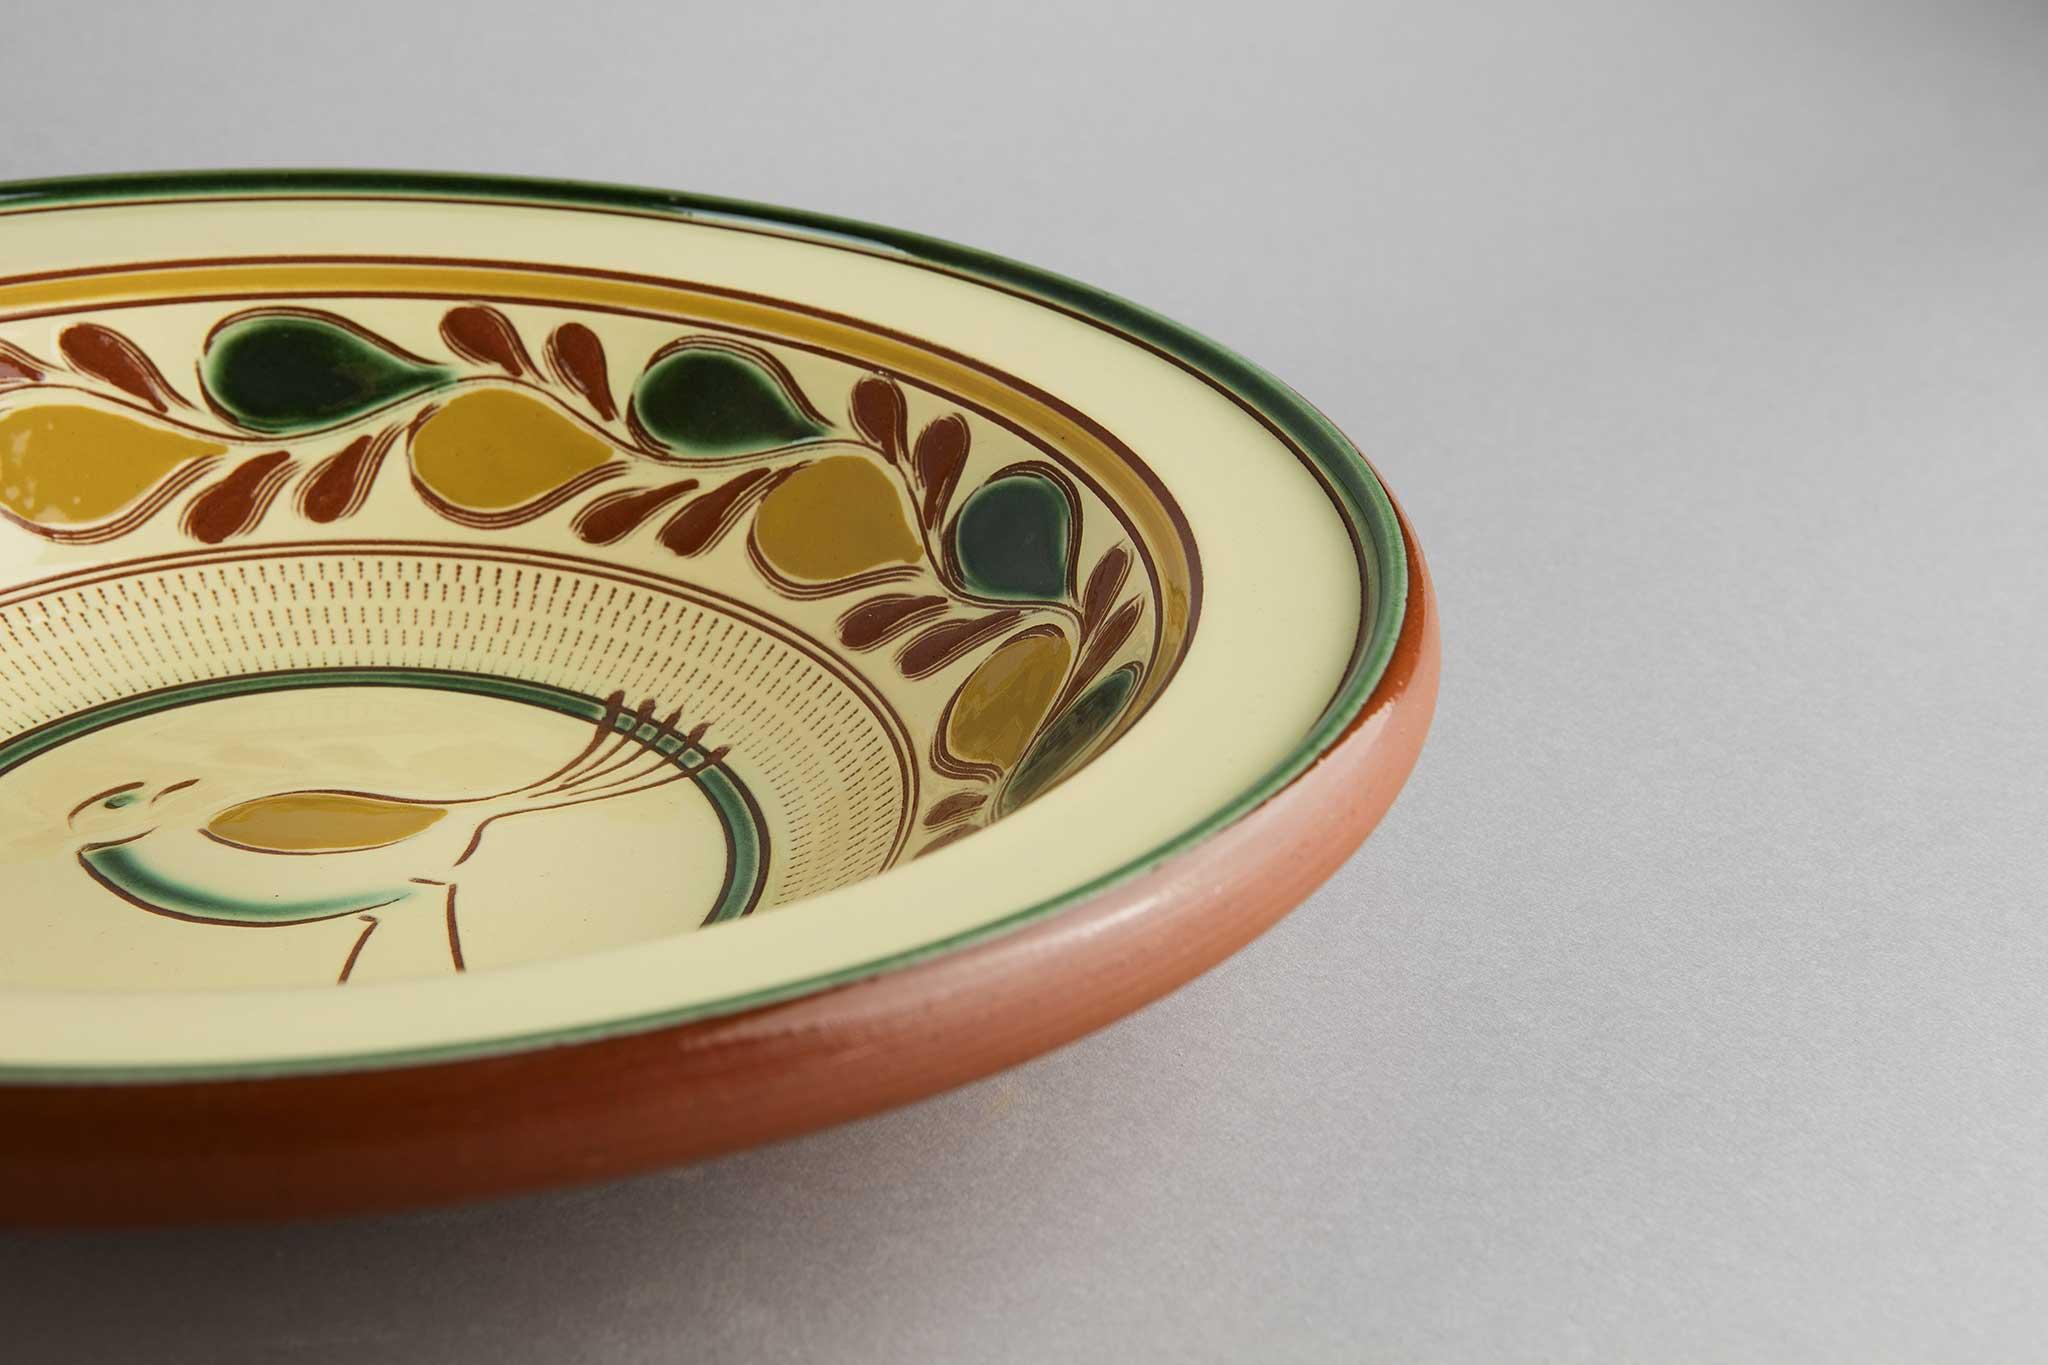 Serveringsfat, lite, fugl, fra Potteriet Røros. Foto: Tom Gustavsen